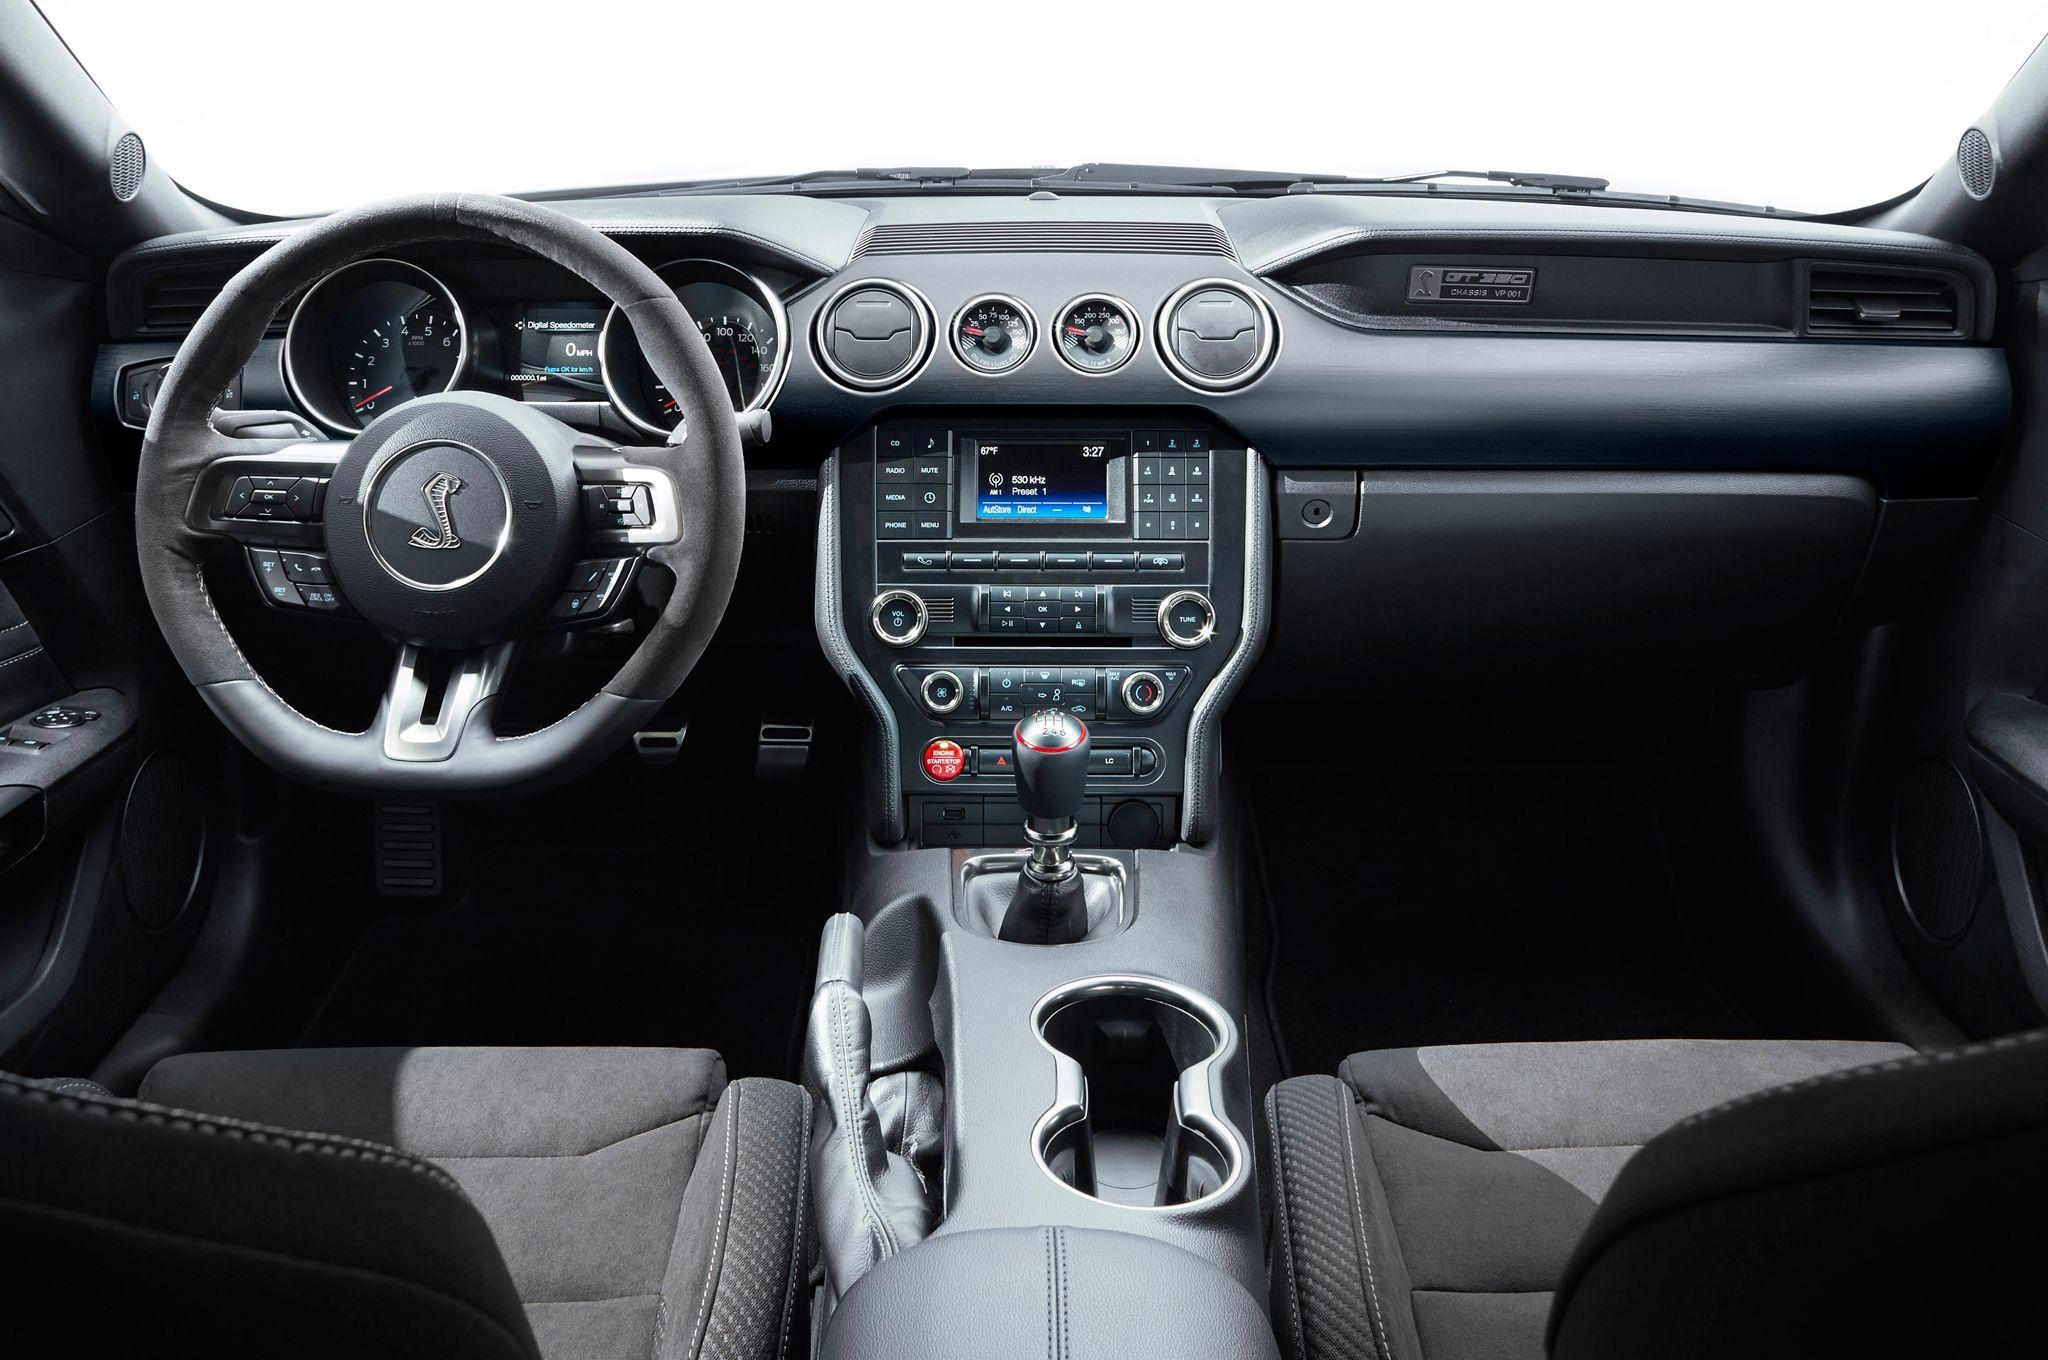 Gt350r Interior